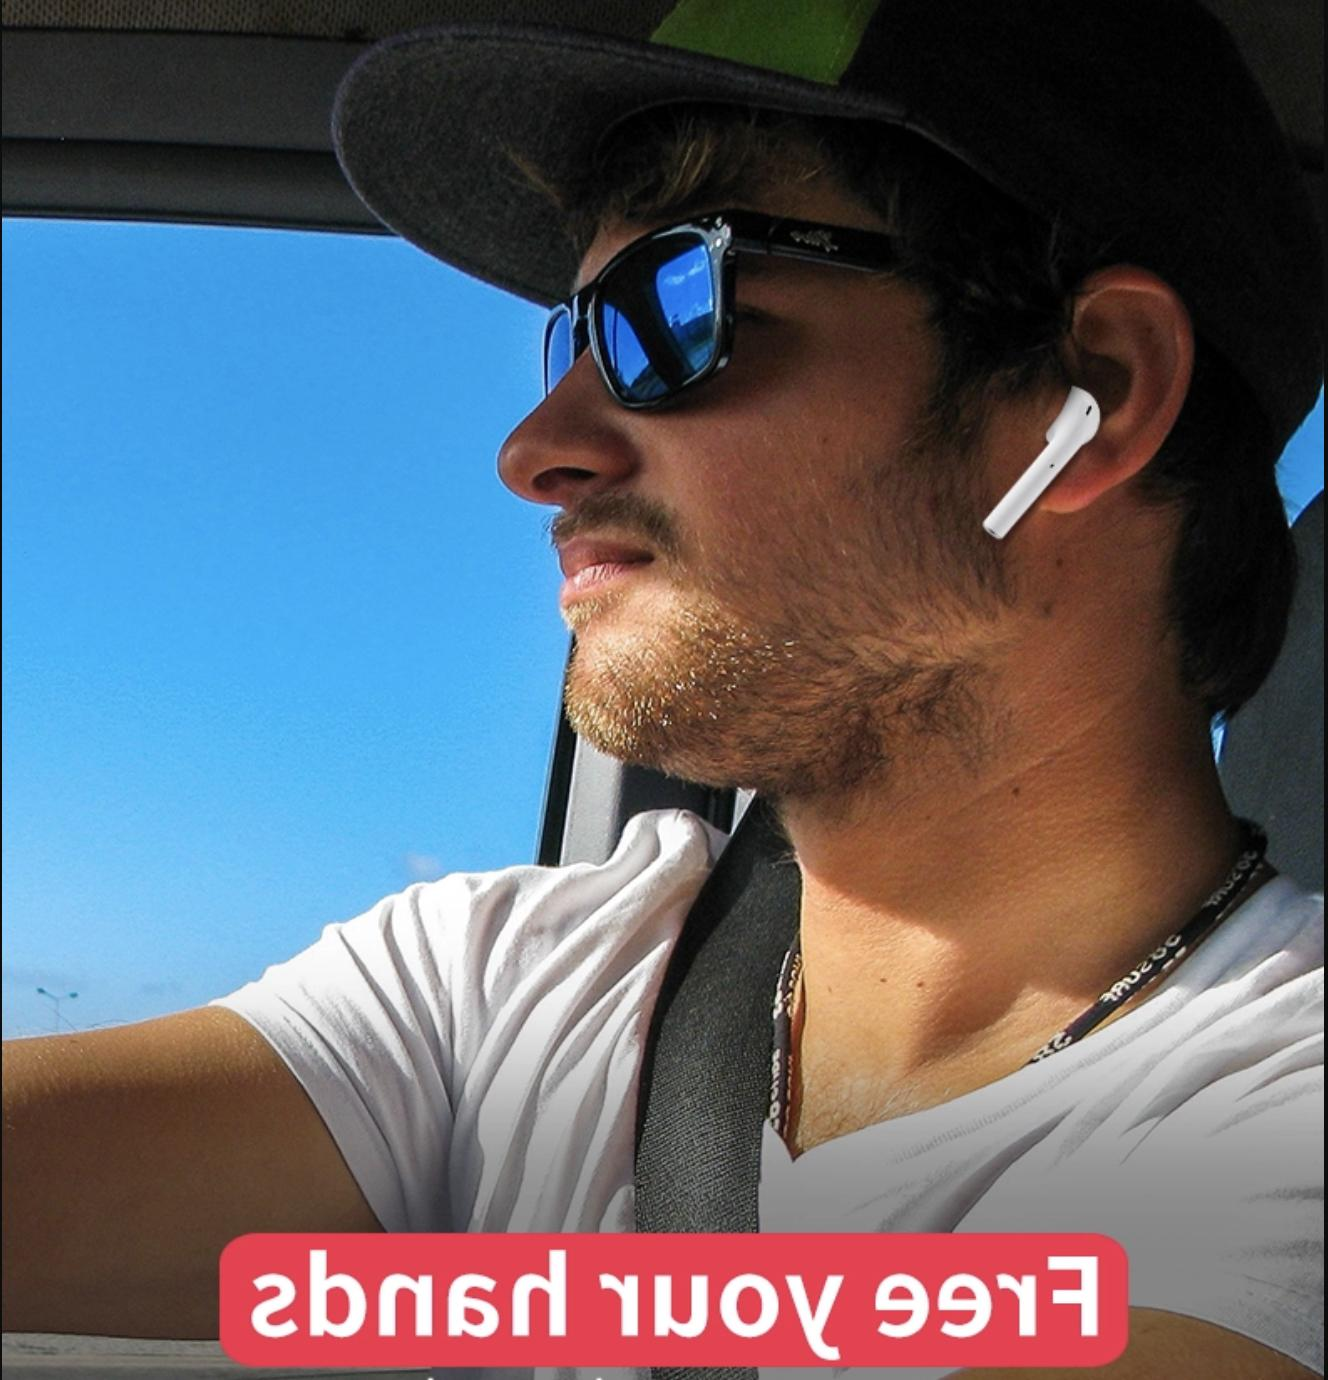 2019 *NEW* Wireless Bluetooth Headphones Headset Case